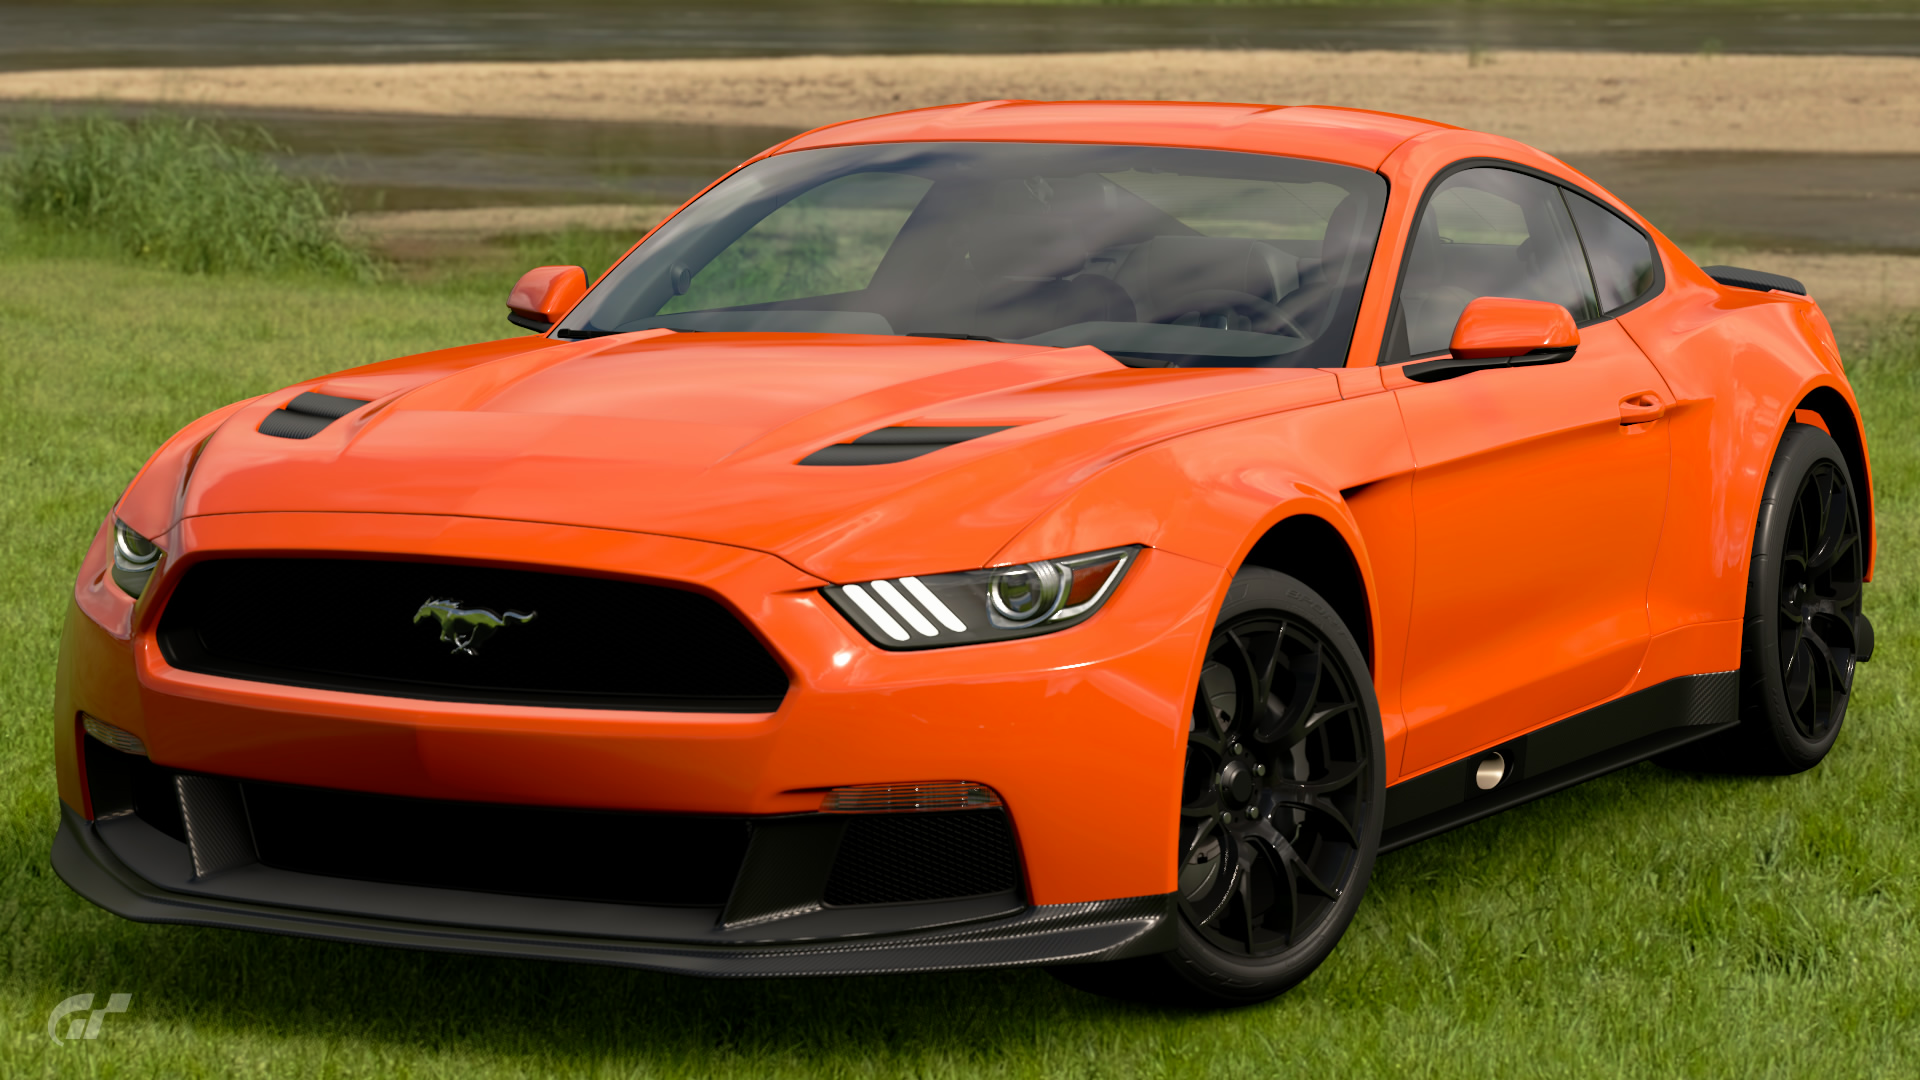 Ford mustang gr 3 road car